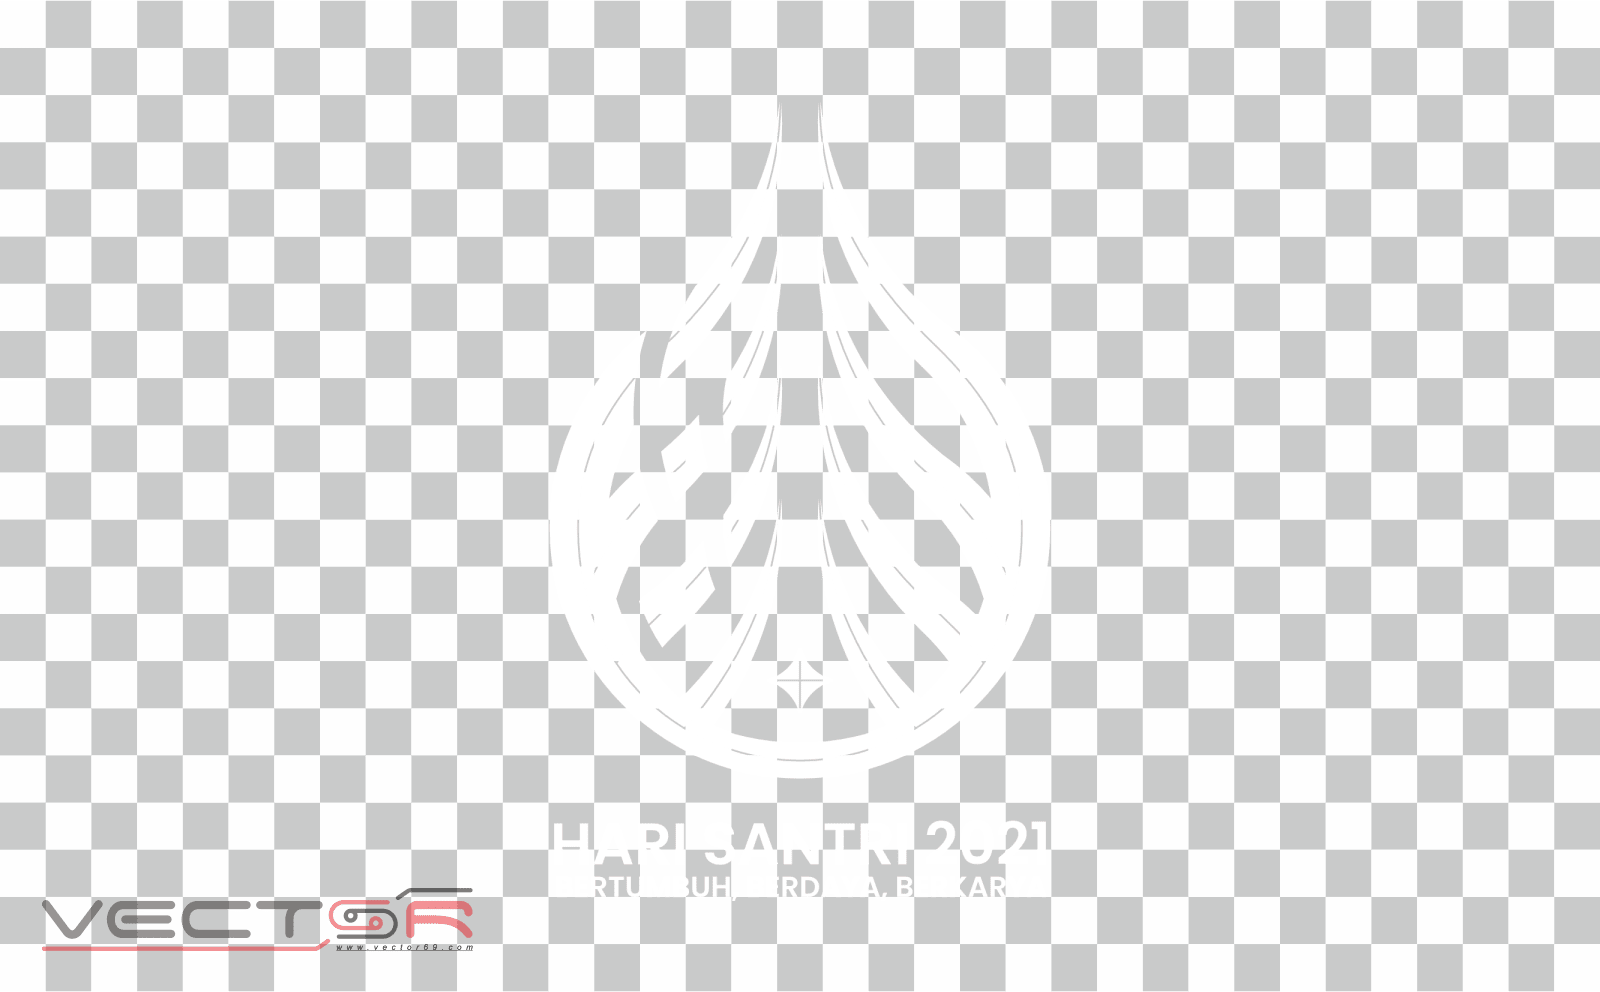 Hari Santri 2021 RMI-NU White Logo - Download .PNG (Portable Network Graphics) Transparent Images